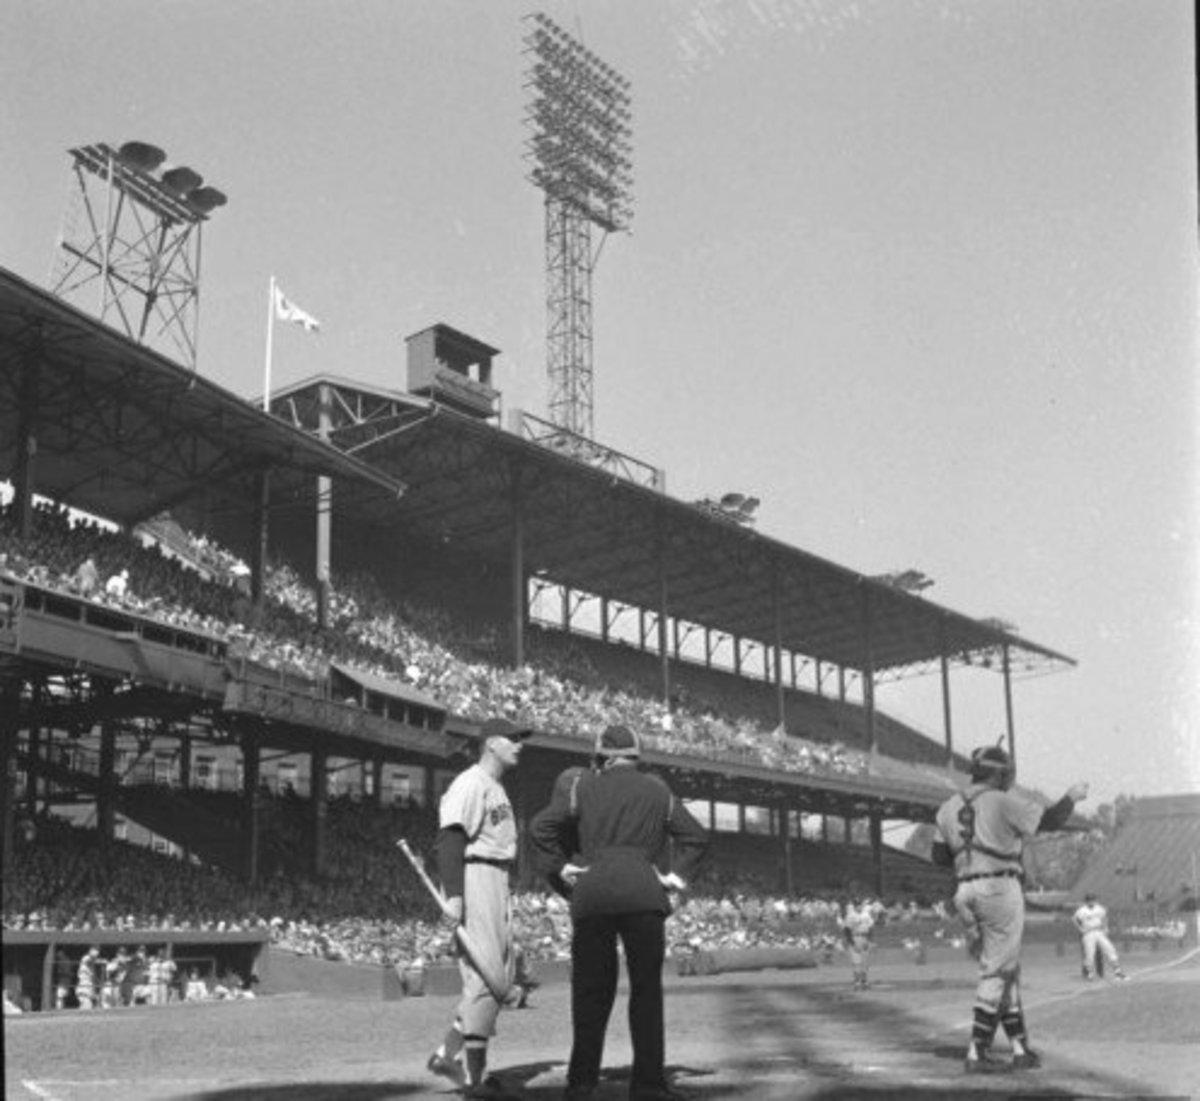 Griffith Stadium; (the second) Home of the original Washington Senators (until 1961)